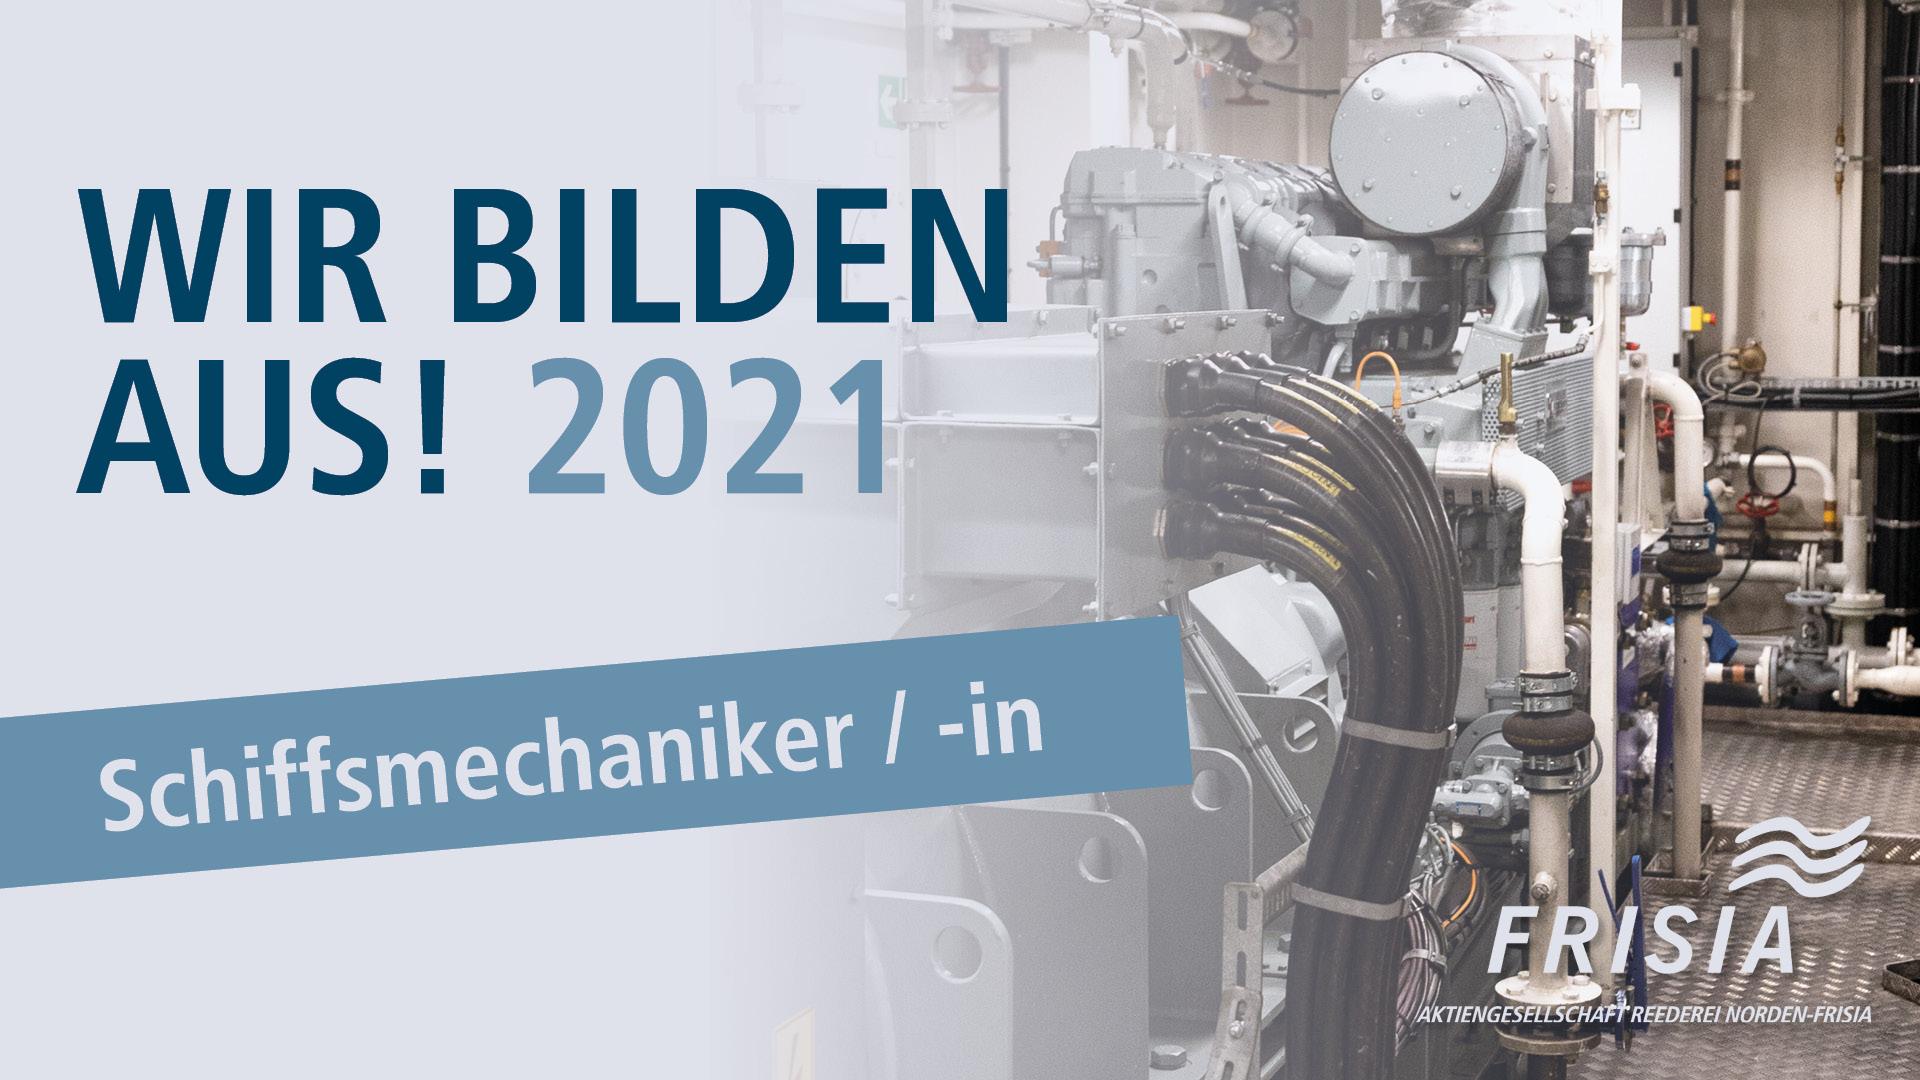 SM 20200929_fa7515dd0934bc8a18a40bb2a851897d.jpg – AG Reederei Norden-Frisia